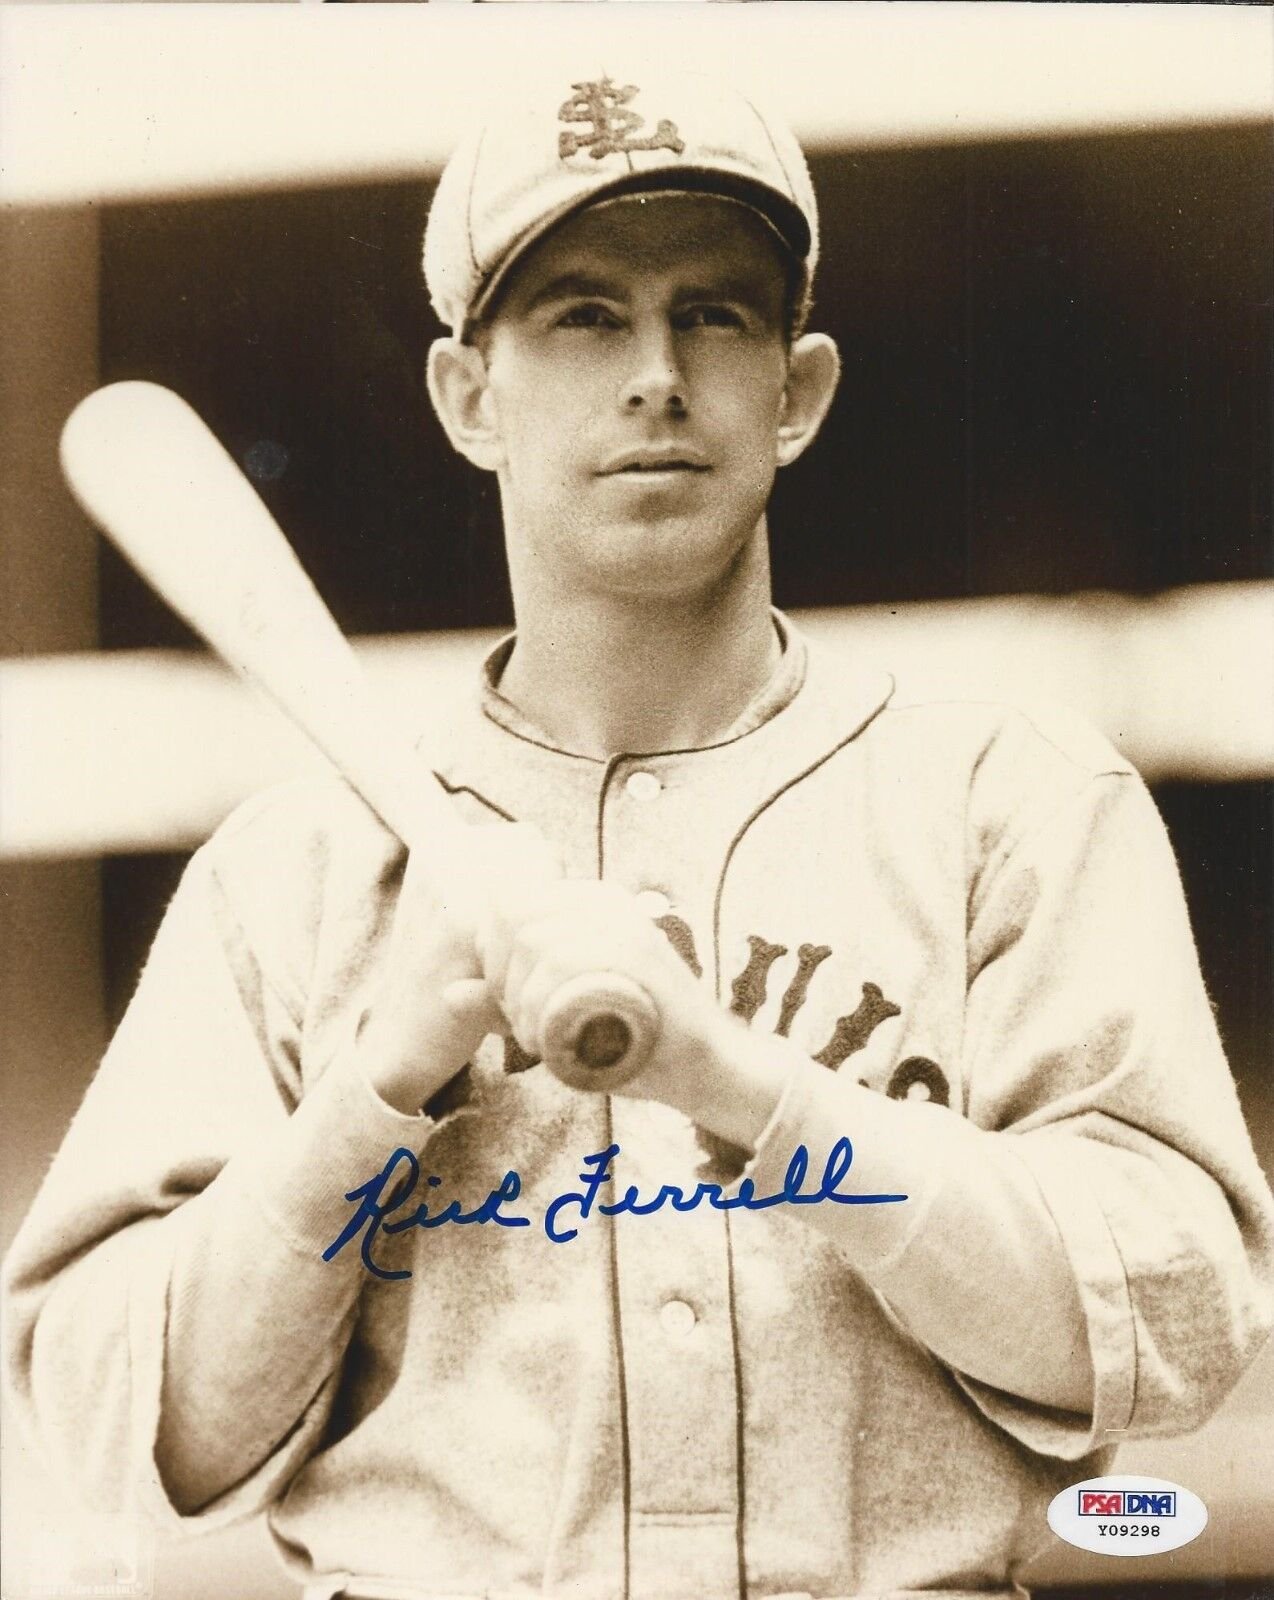 Rick Ferrell St. Louis Cardinals signed 8x10 photo PSA/DNA #Y09298